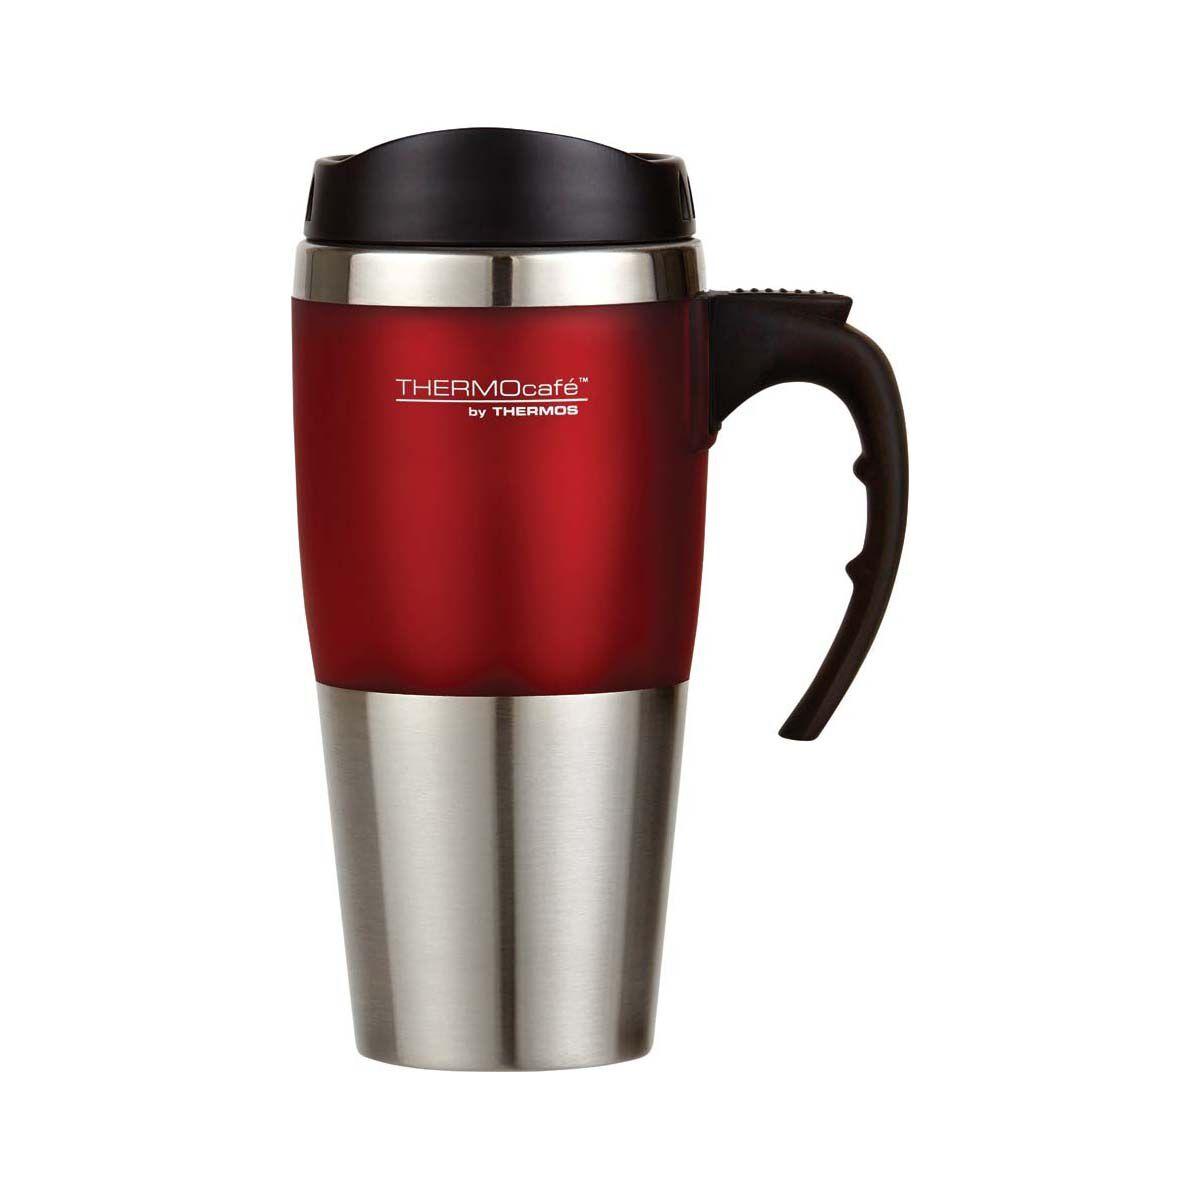 450ml Mug Thermocafe Travel Thermos Red KJTlFc13